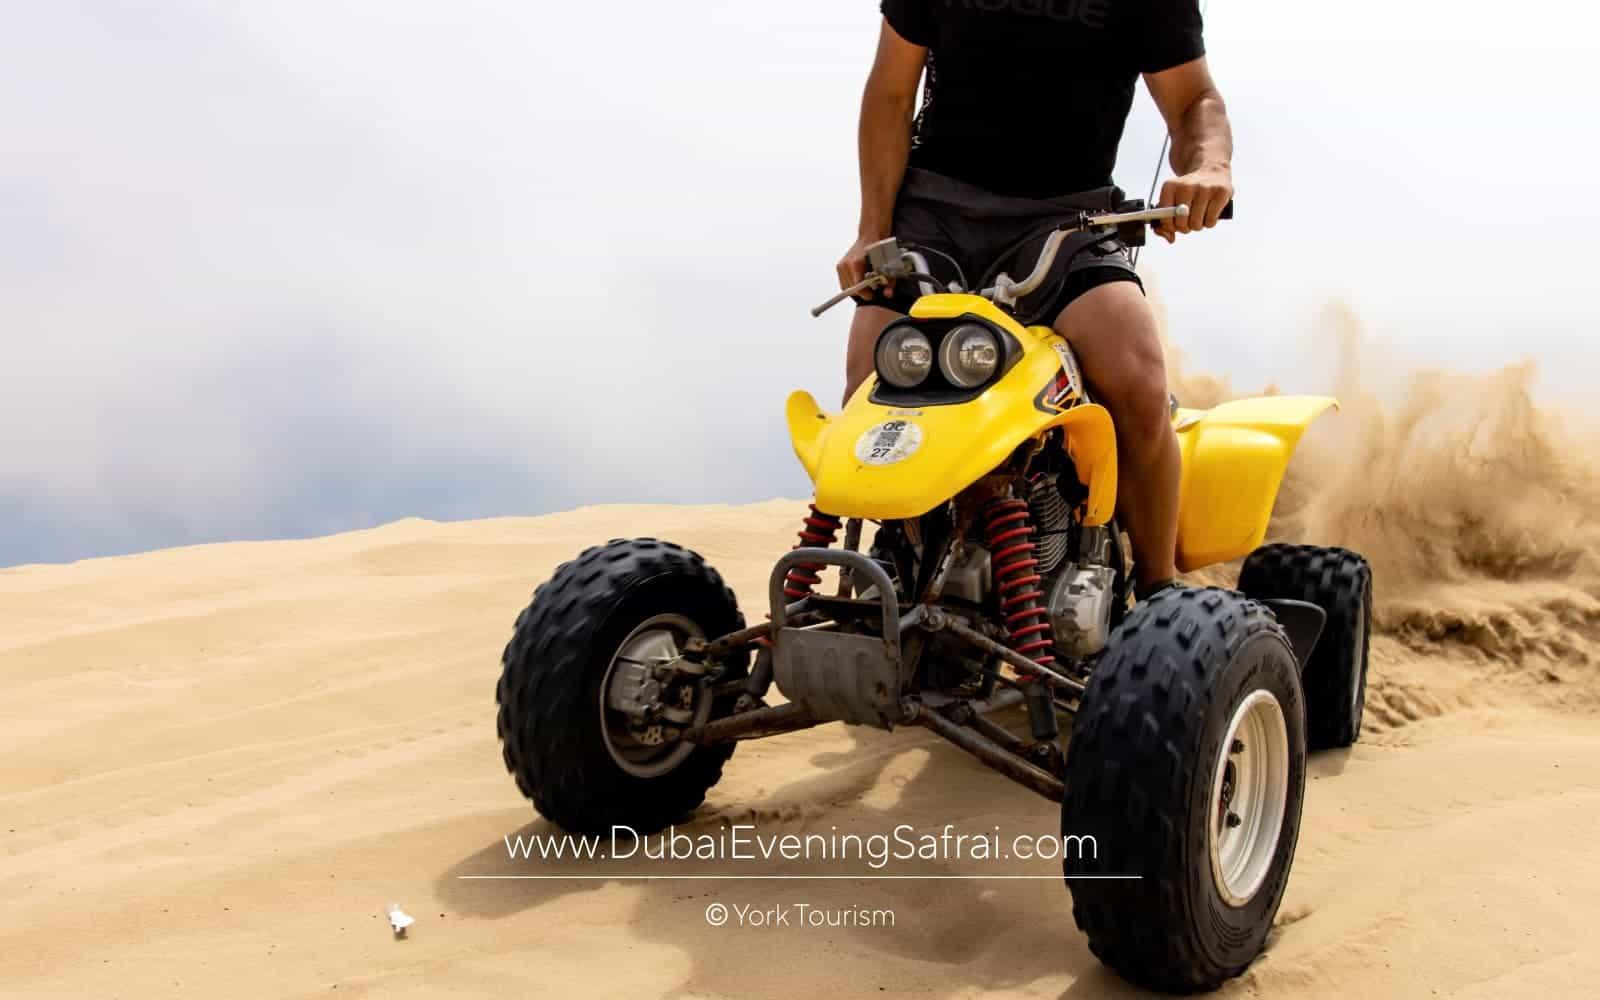 ATV quad bike in desert safari